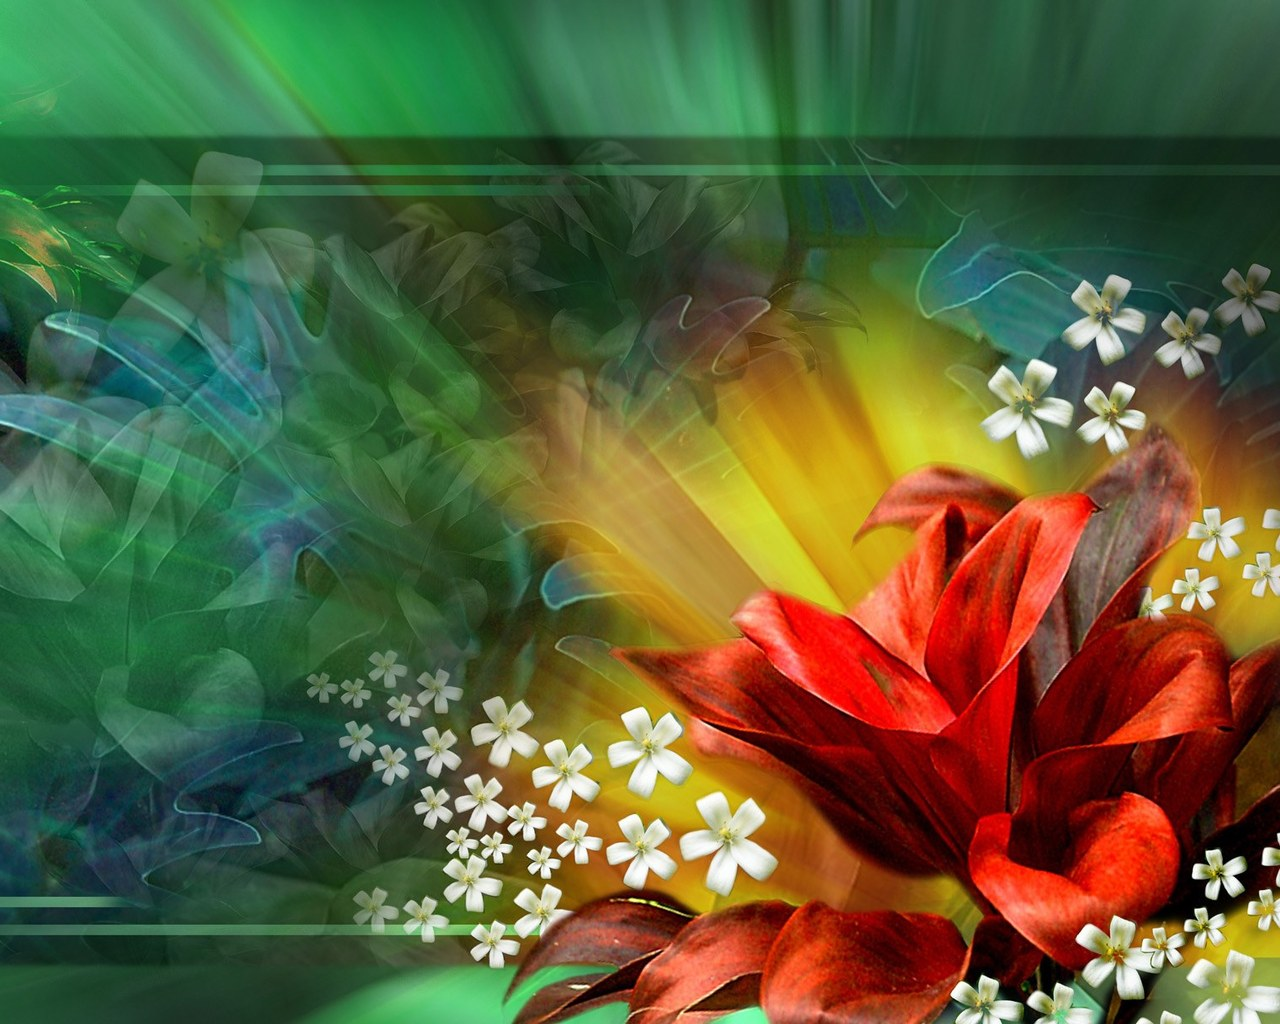 http://1.bp.blogspot.com/-Ib_paah1EPU/TfDzpy24rnI/AAAAAAAAAJY/DTotQr58gzQ/s1600/3D+Digital+Wallpapers-2.jpg